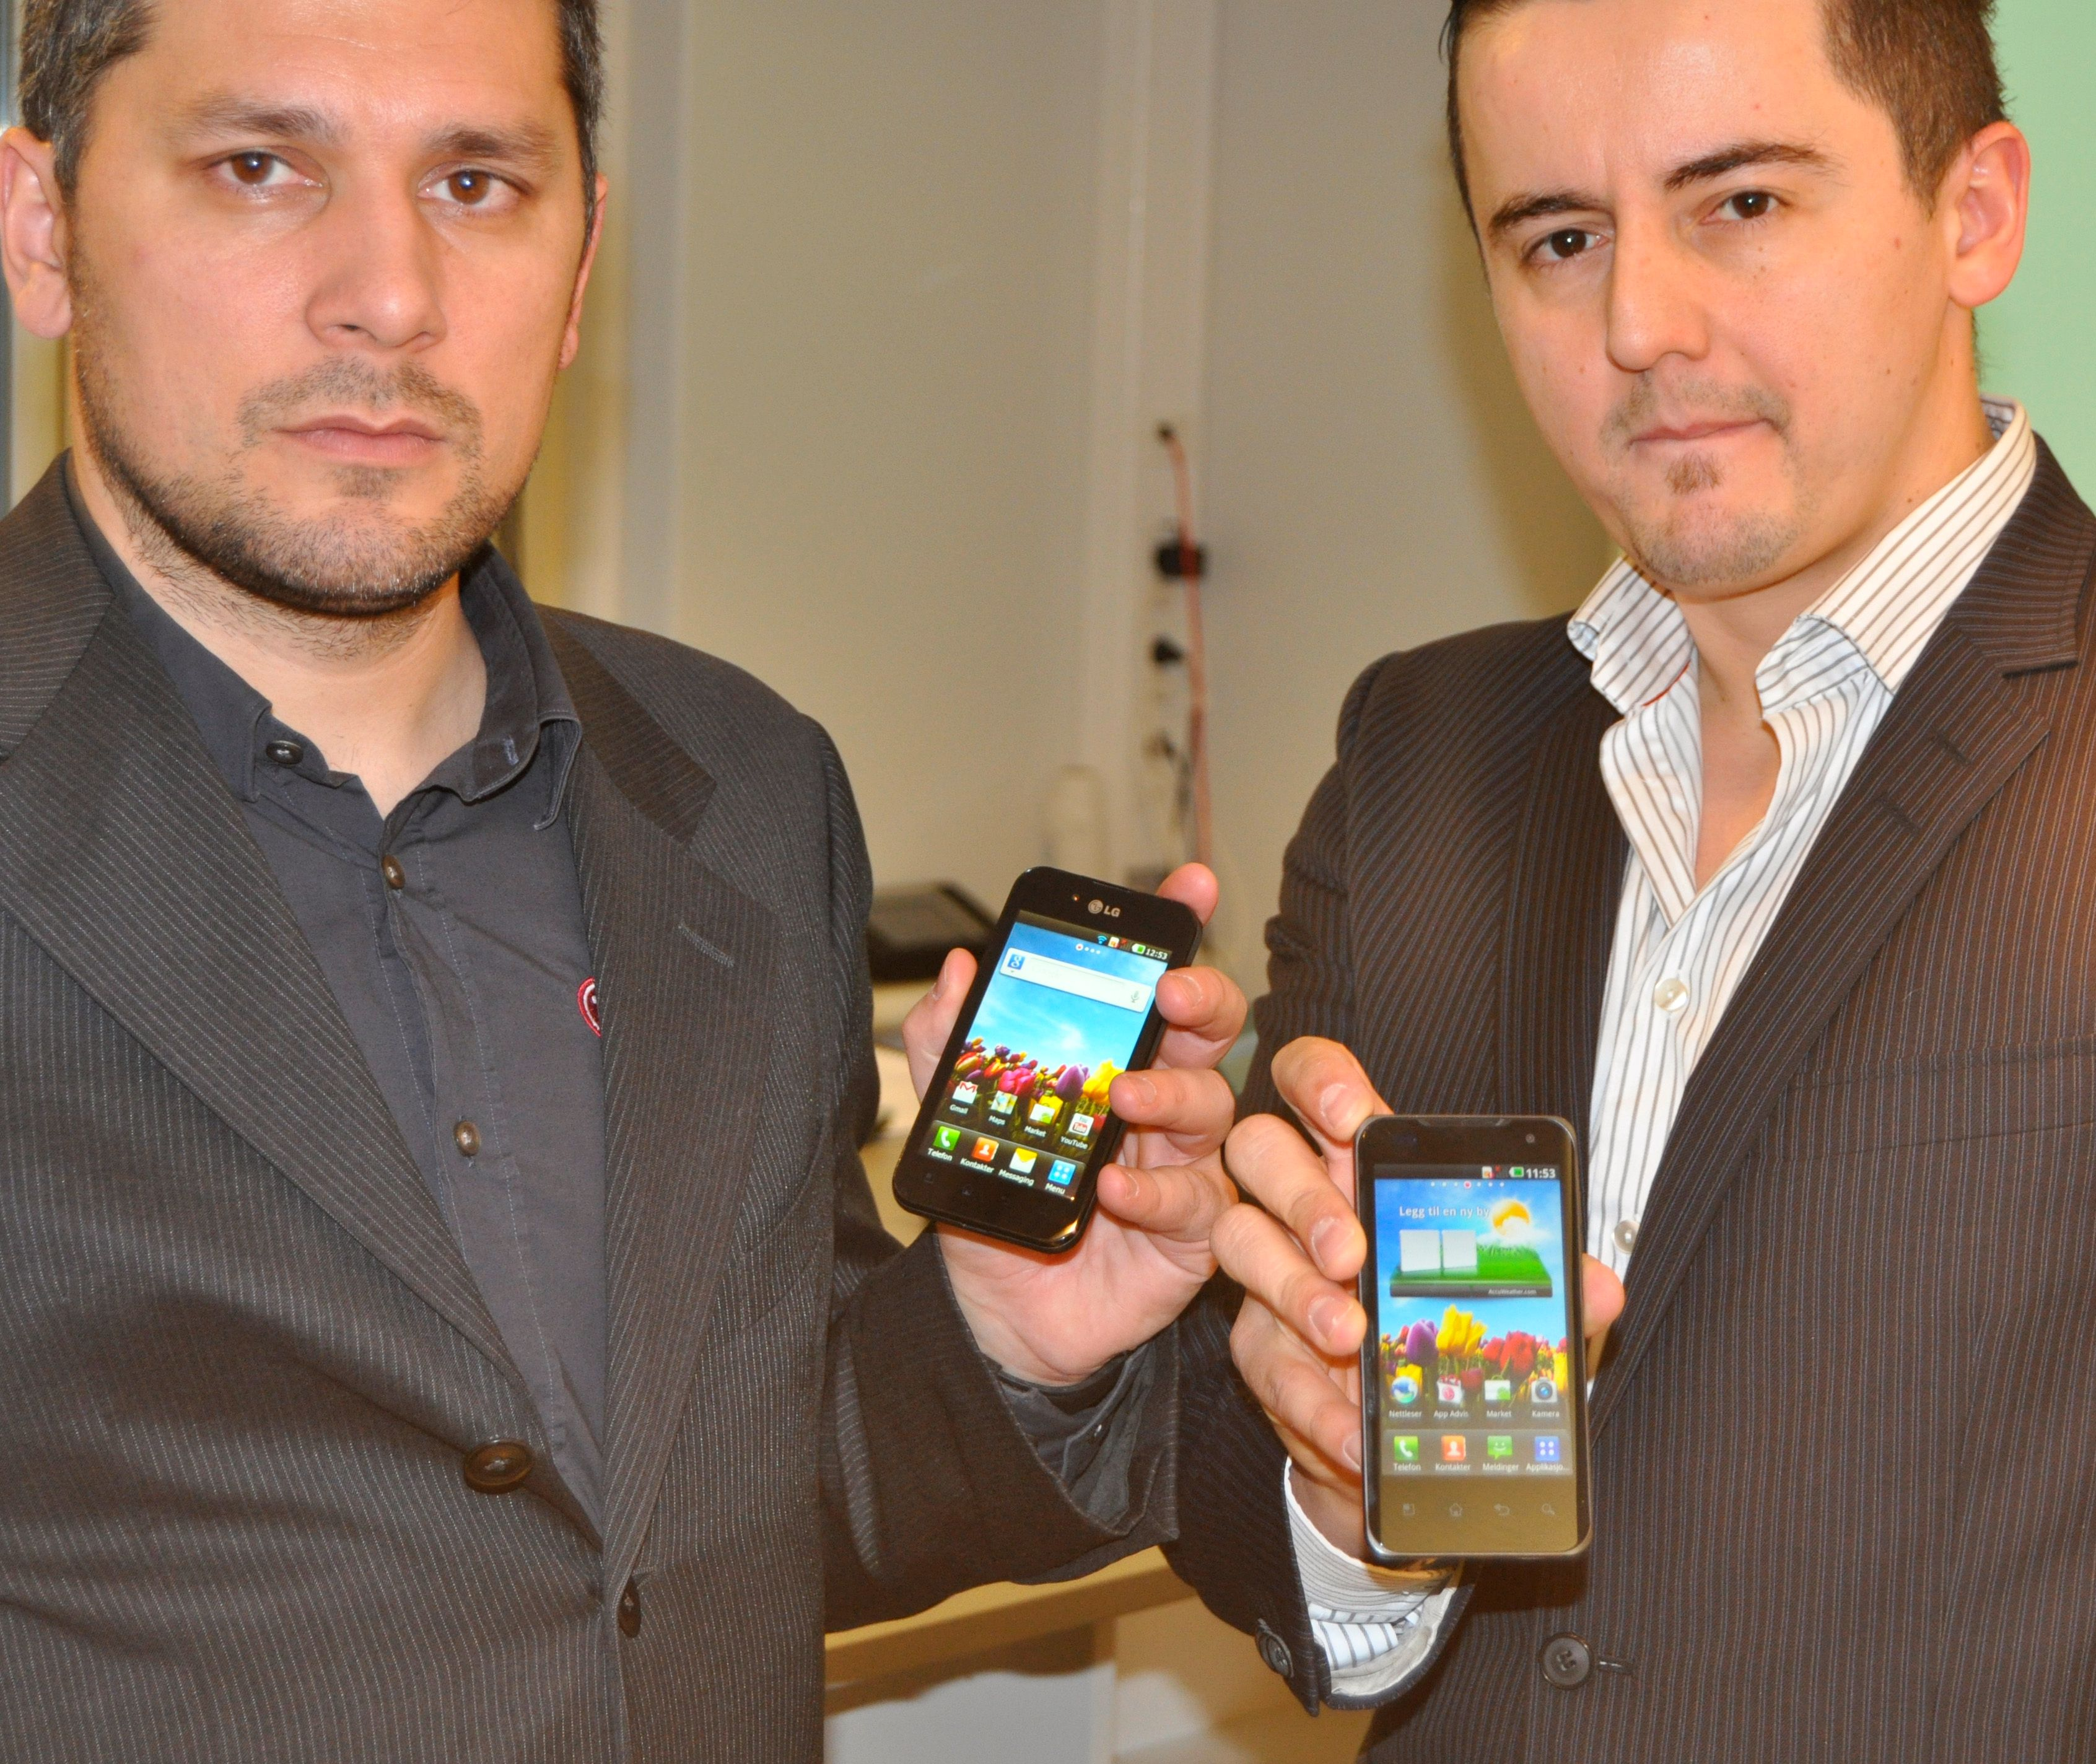 LGs norske markedssjef André Seielstad og teknisk ansvarlig Rizah Konjic viser frem de to nye Optimus-modellene.